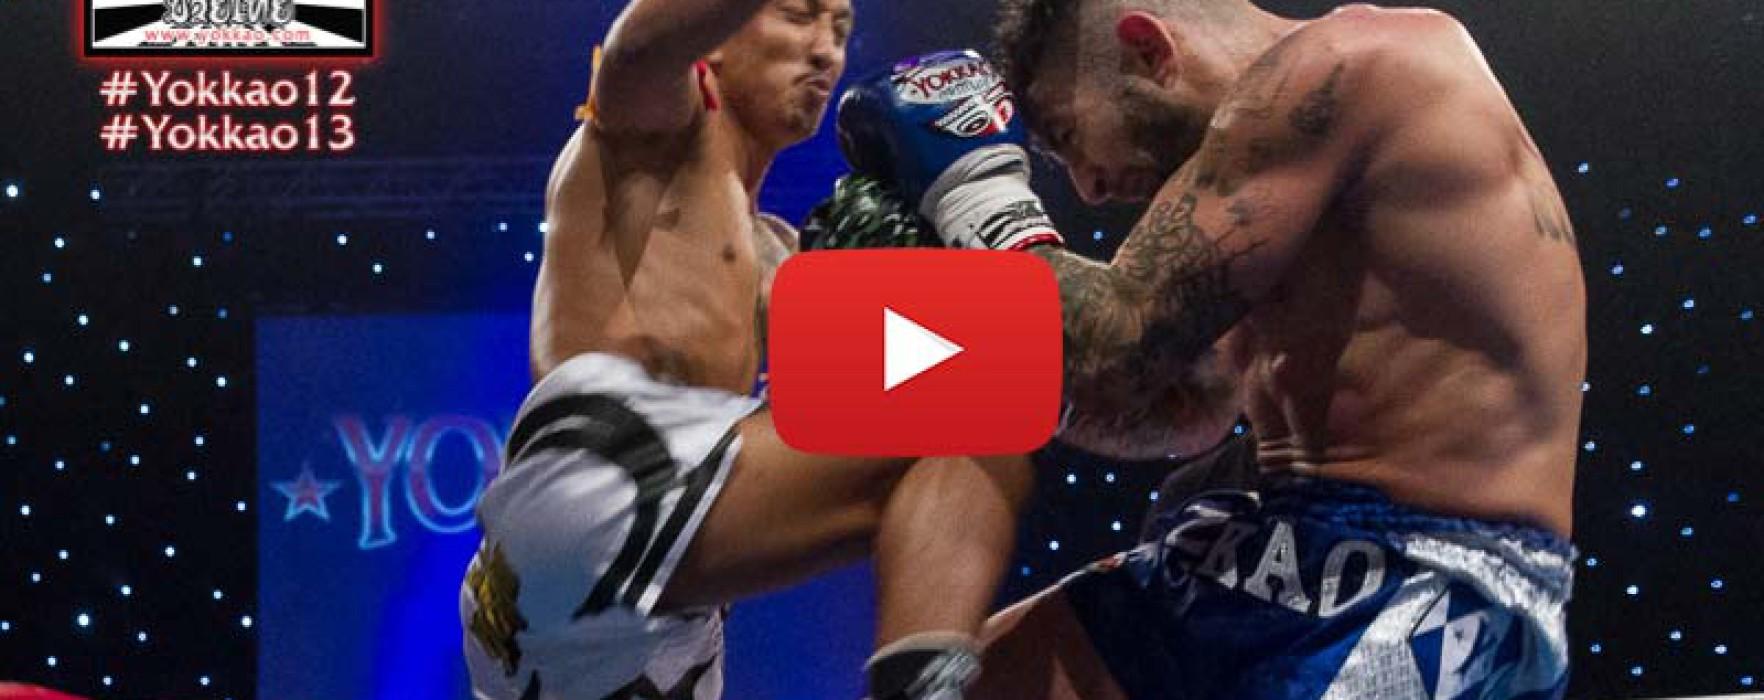 Video: Pakorn PKSaenchaimuaythaigym vs Liam Harrison – Yokkao 13 – 21/03/2015